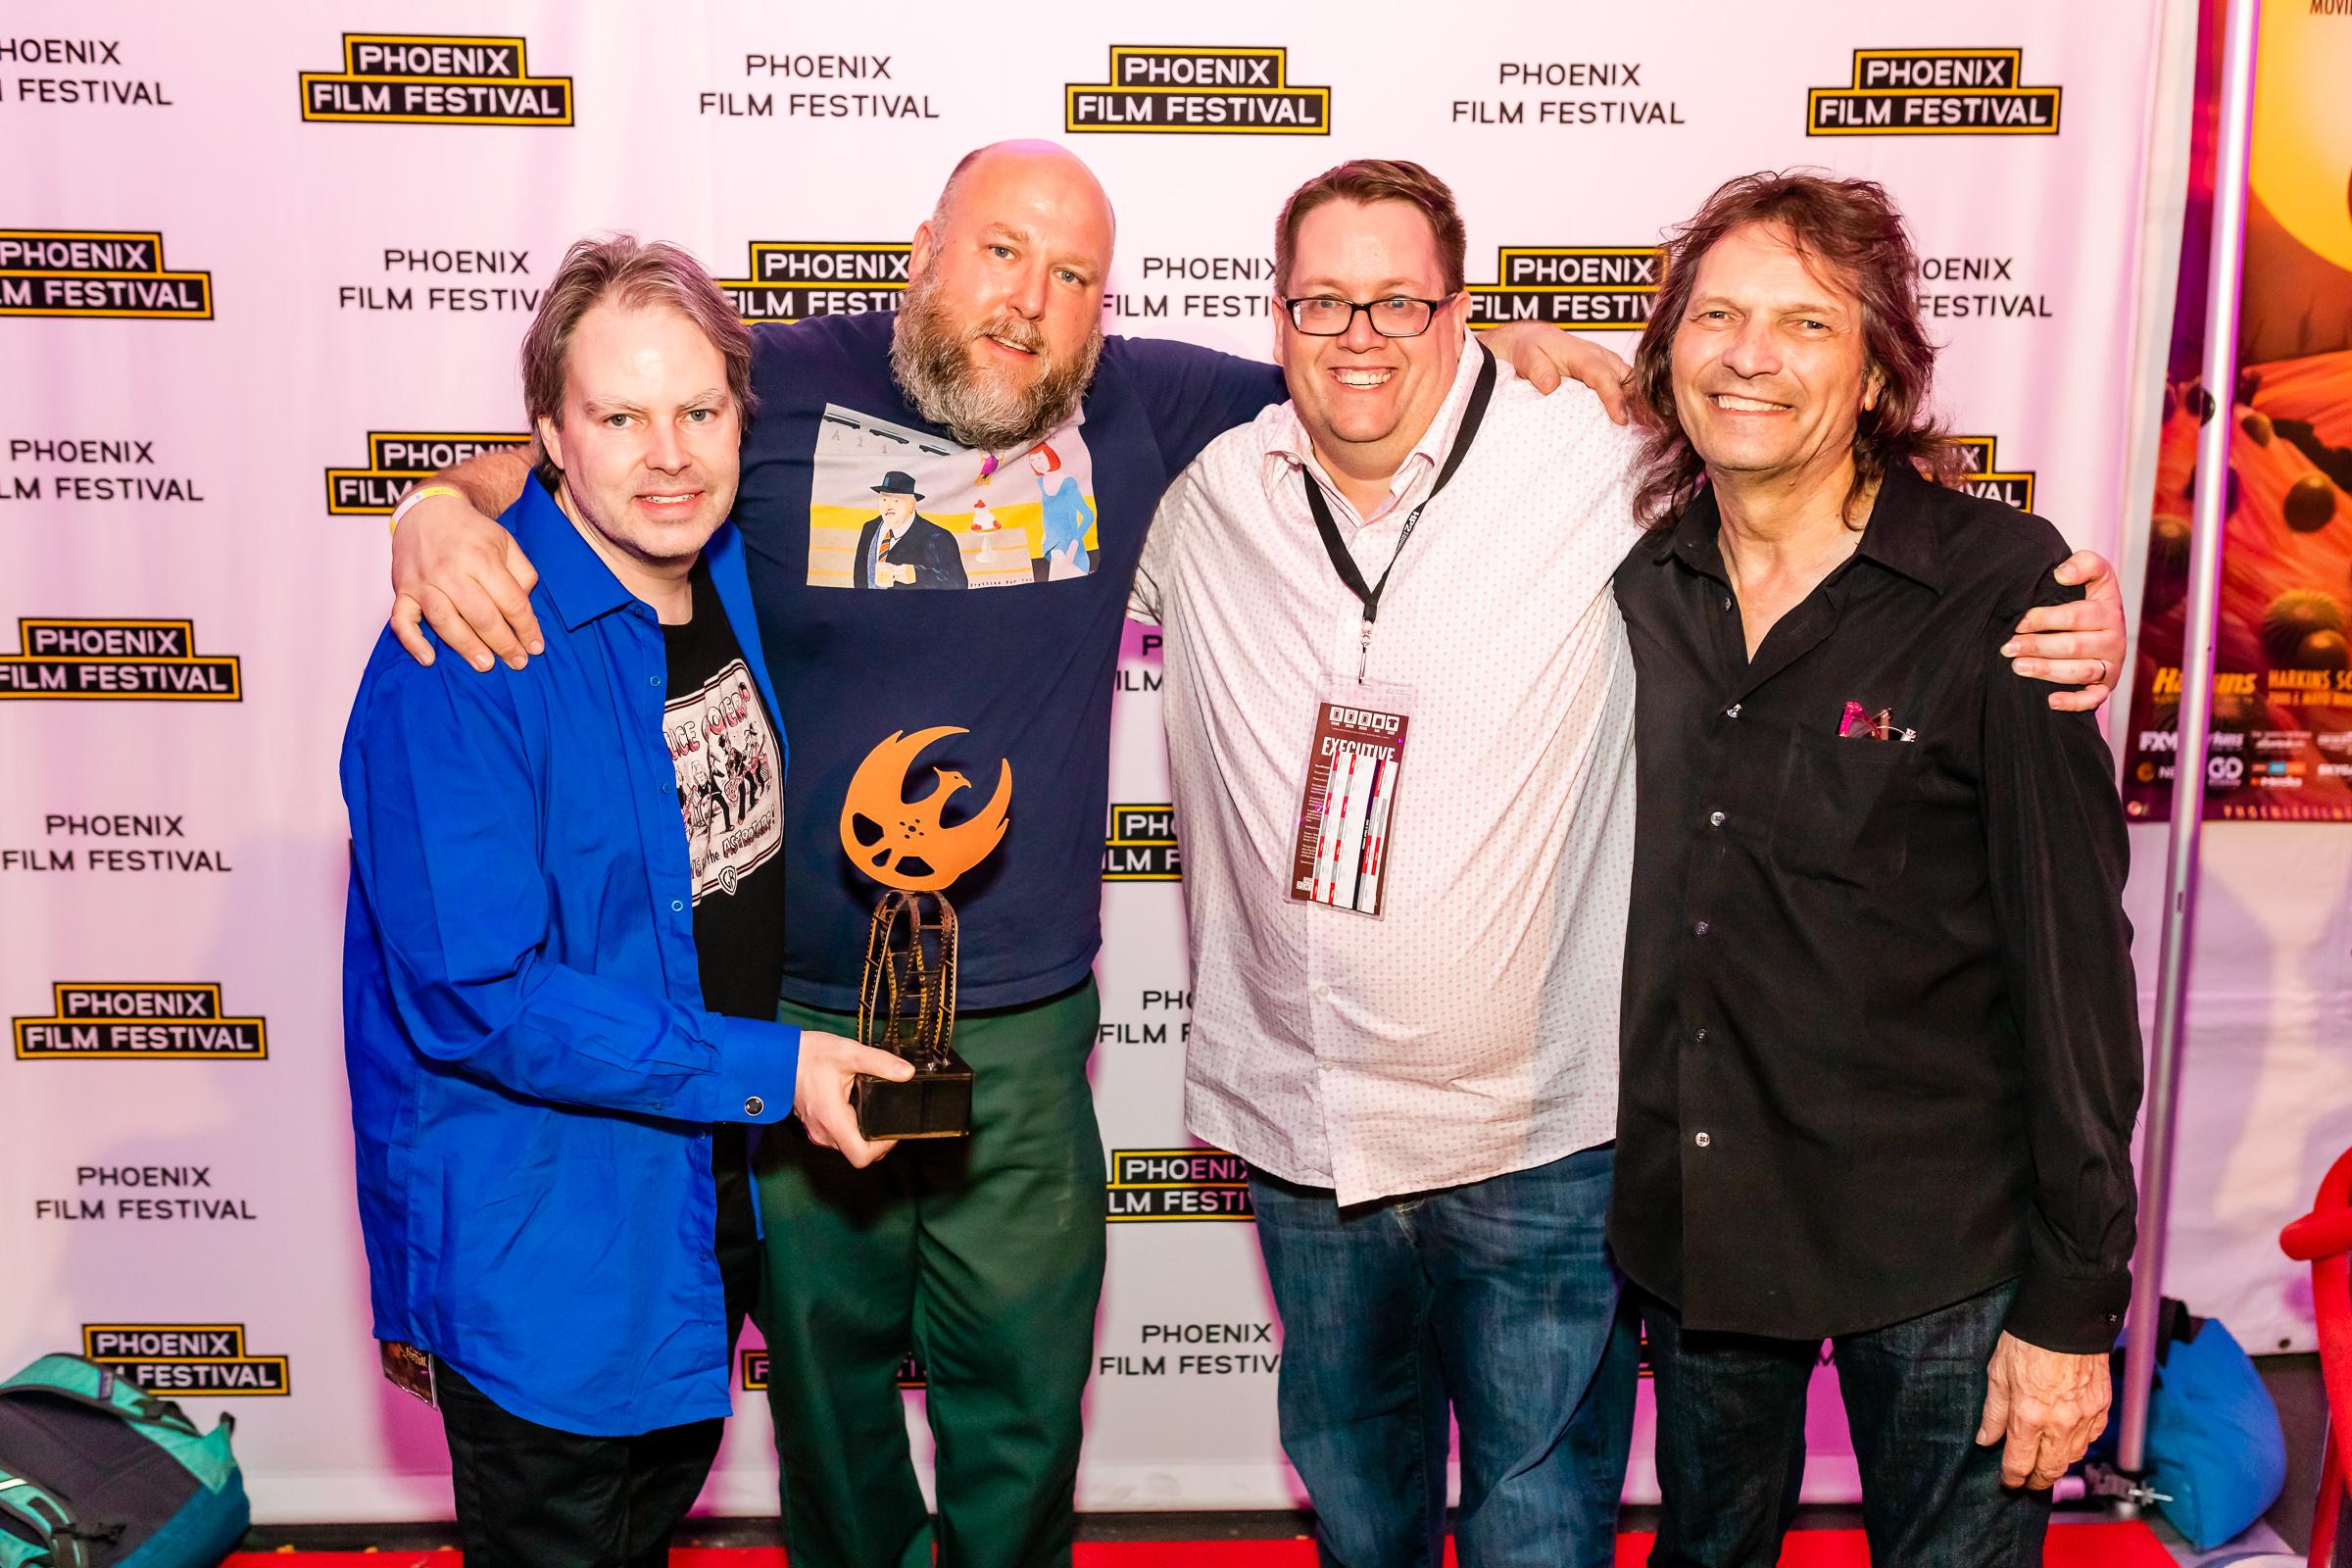 Awards — Phoenix Film Festival